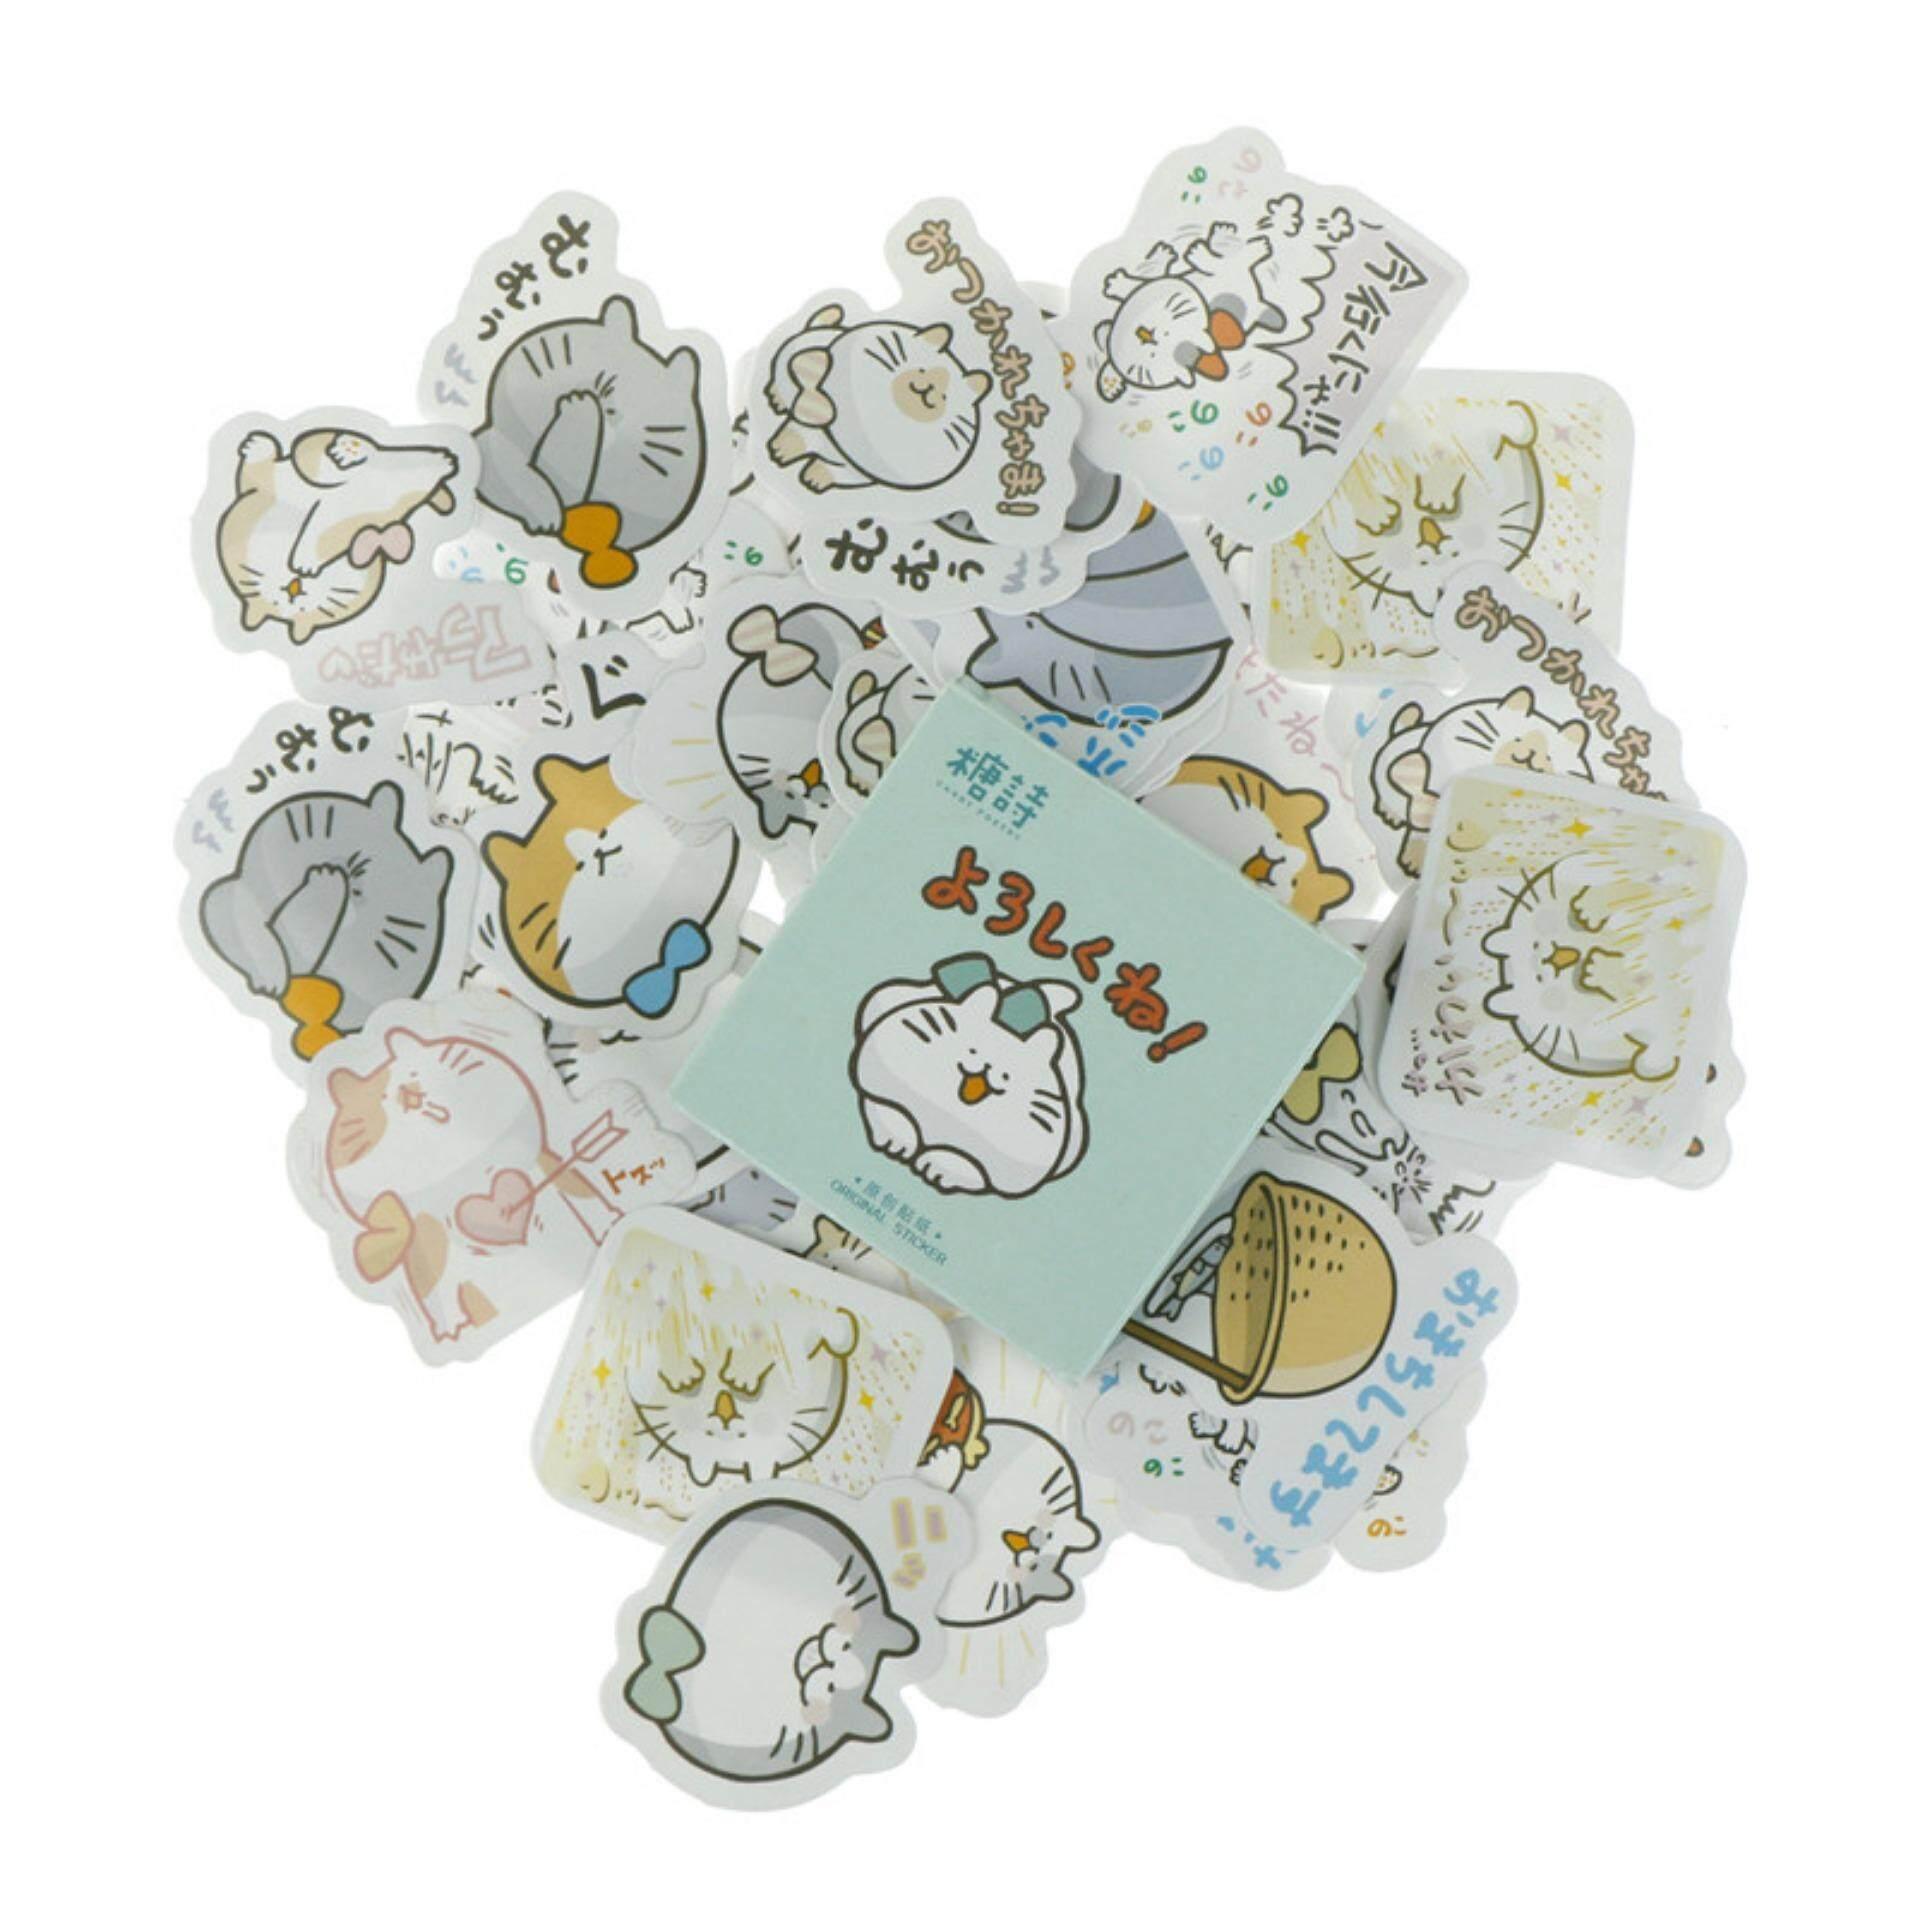 Mua 45pcs Naughty cat Paper Stationery Stickers Scrapbooking DIY Diary Album Label